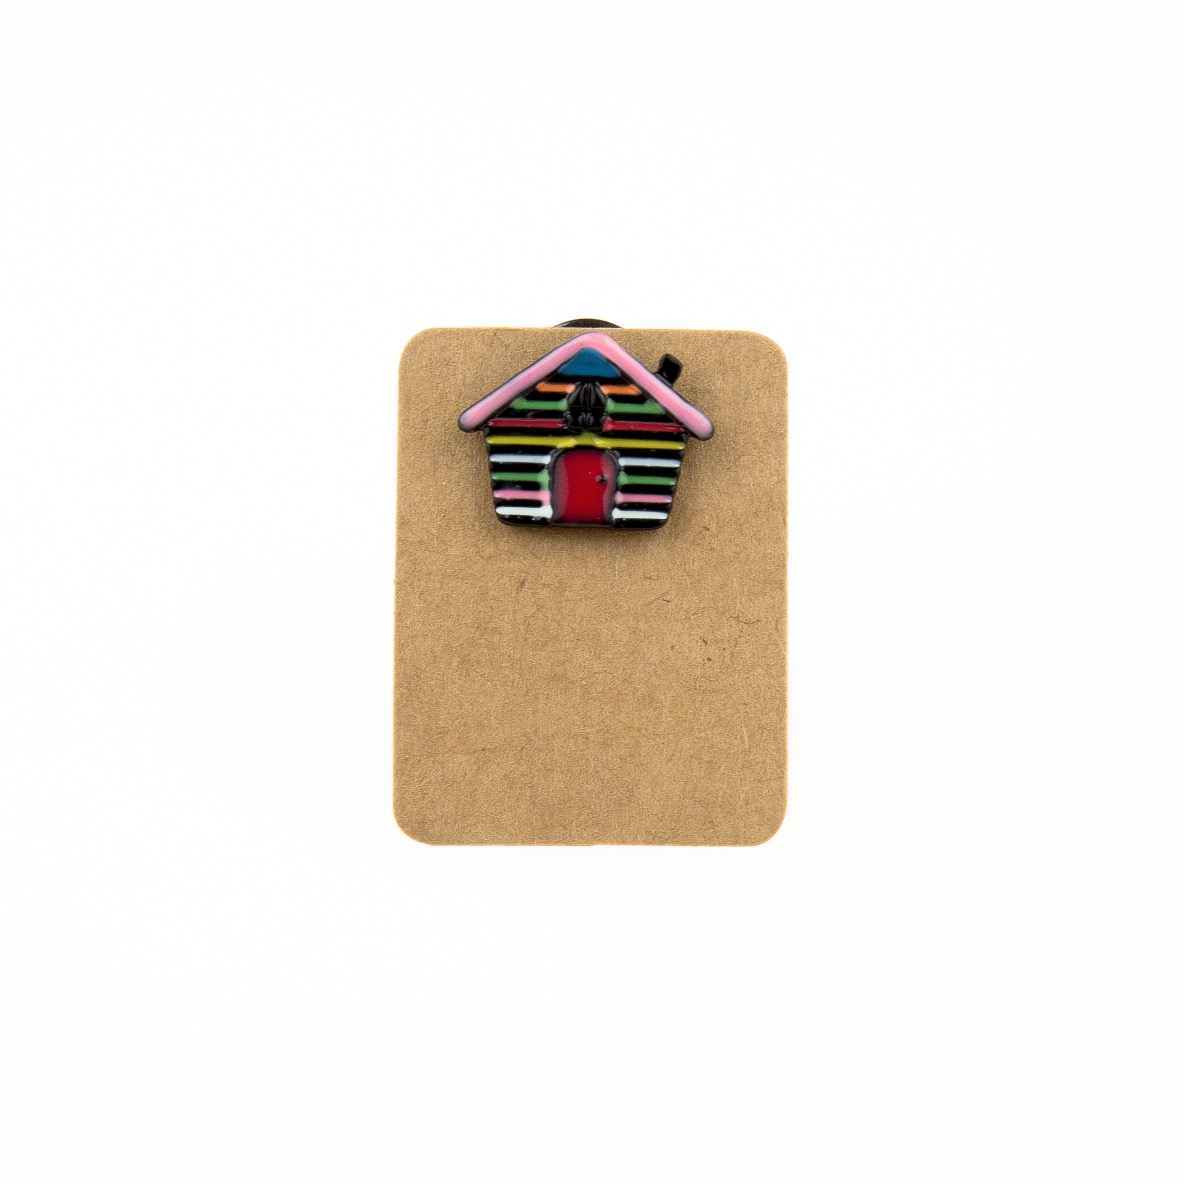 Metal House Pink Roof Enamel Pin Badge